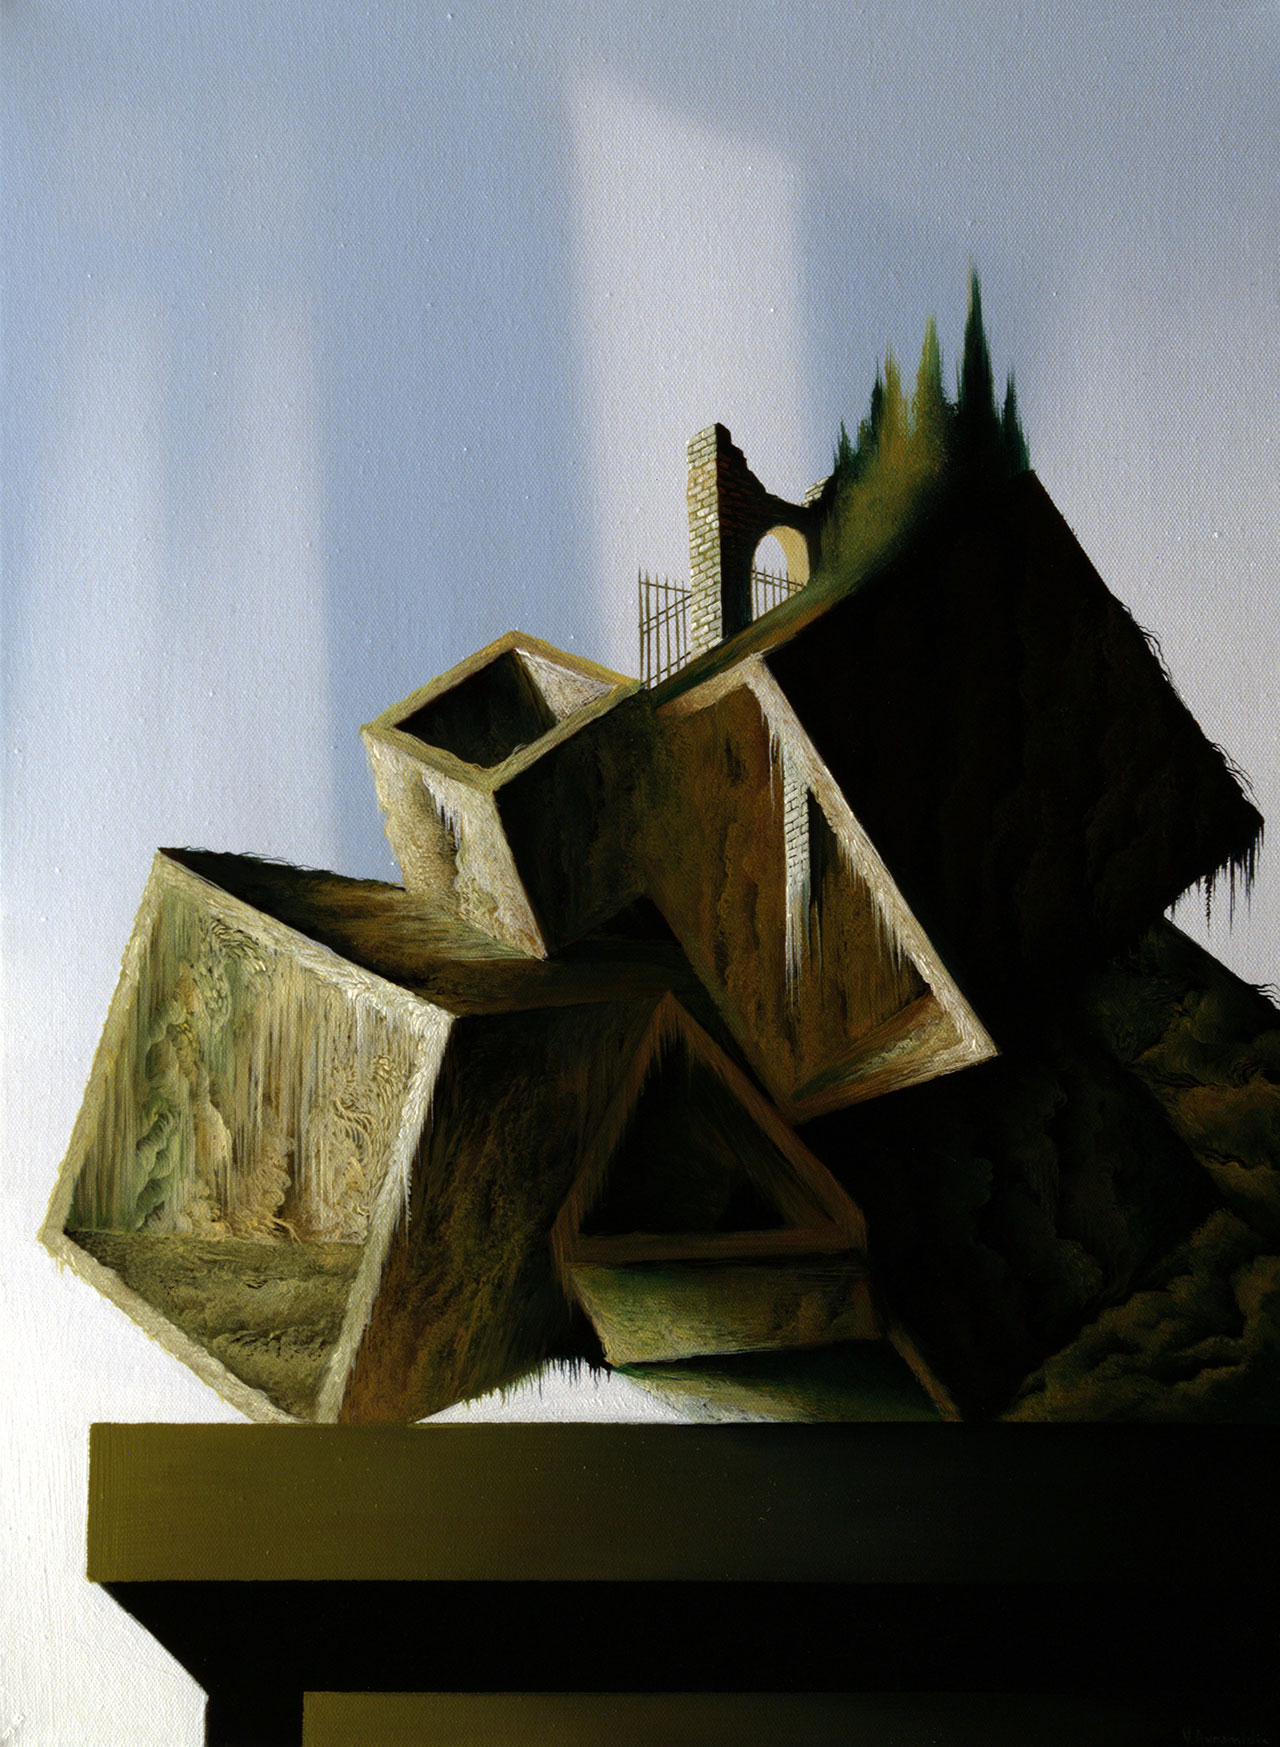 Vasilis Avramidis,The edge, 55x40cm oil on canvas.